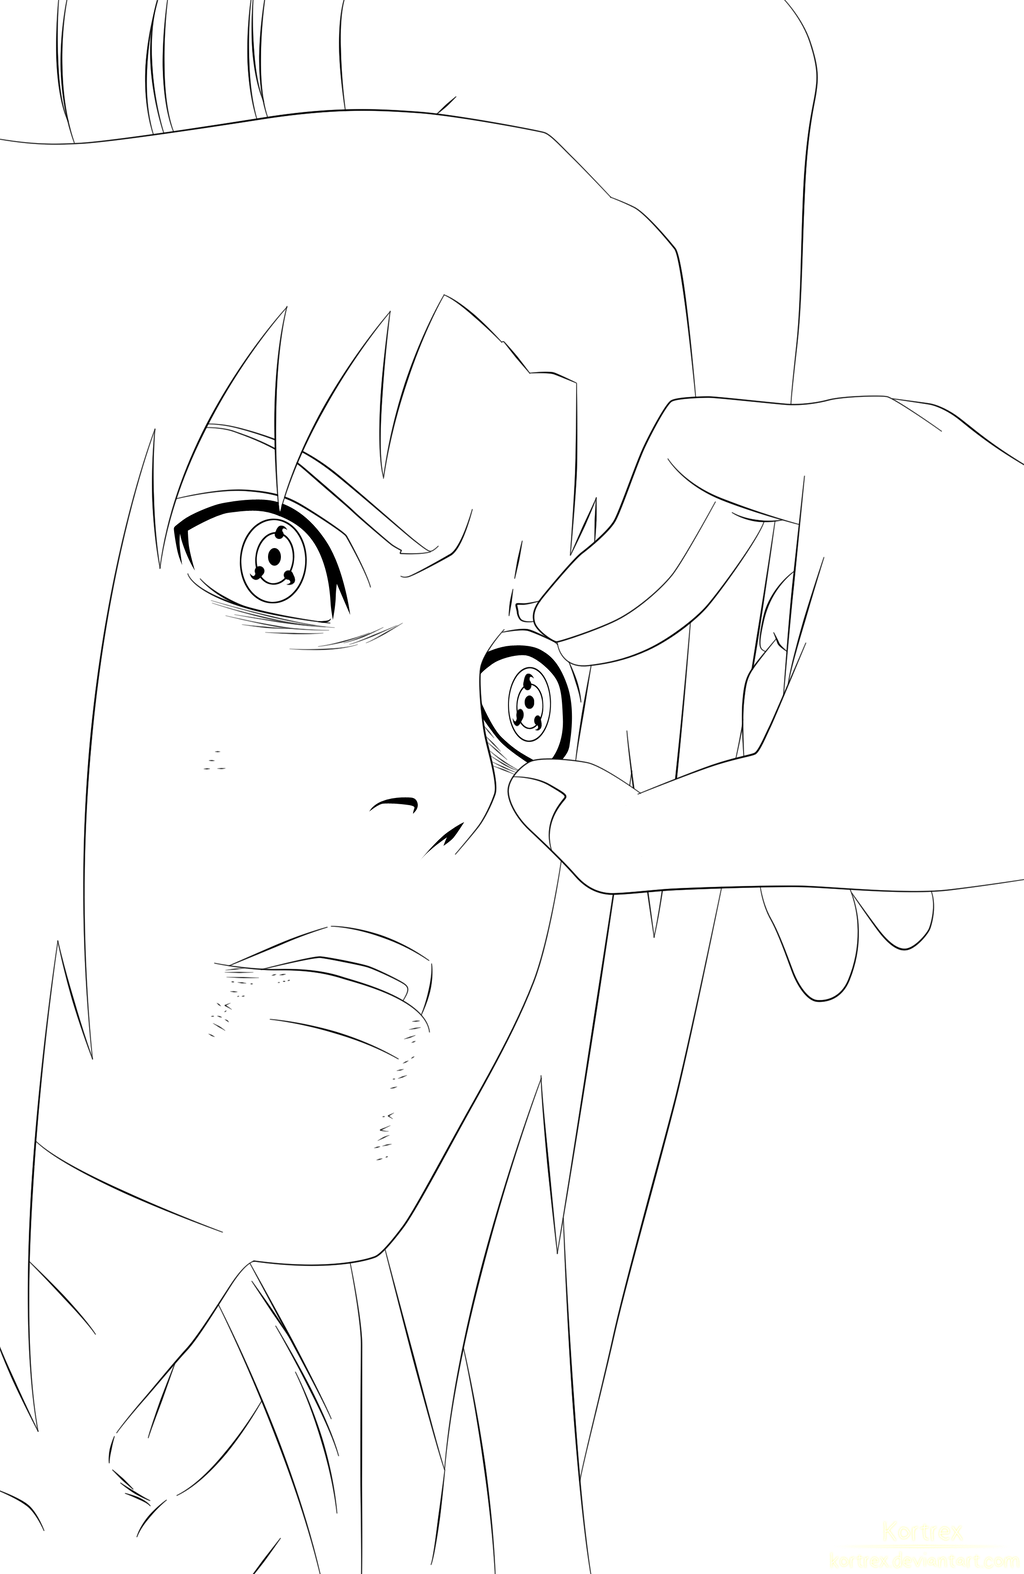 Sasuke Lineart : Sasuke vs itachi lineart by kortrex on deviantart